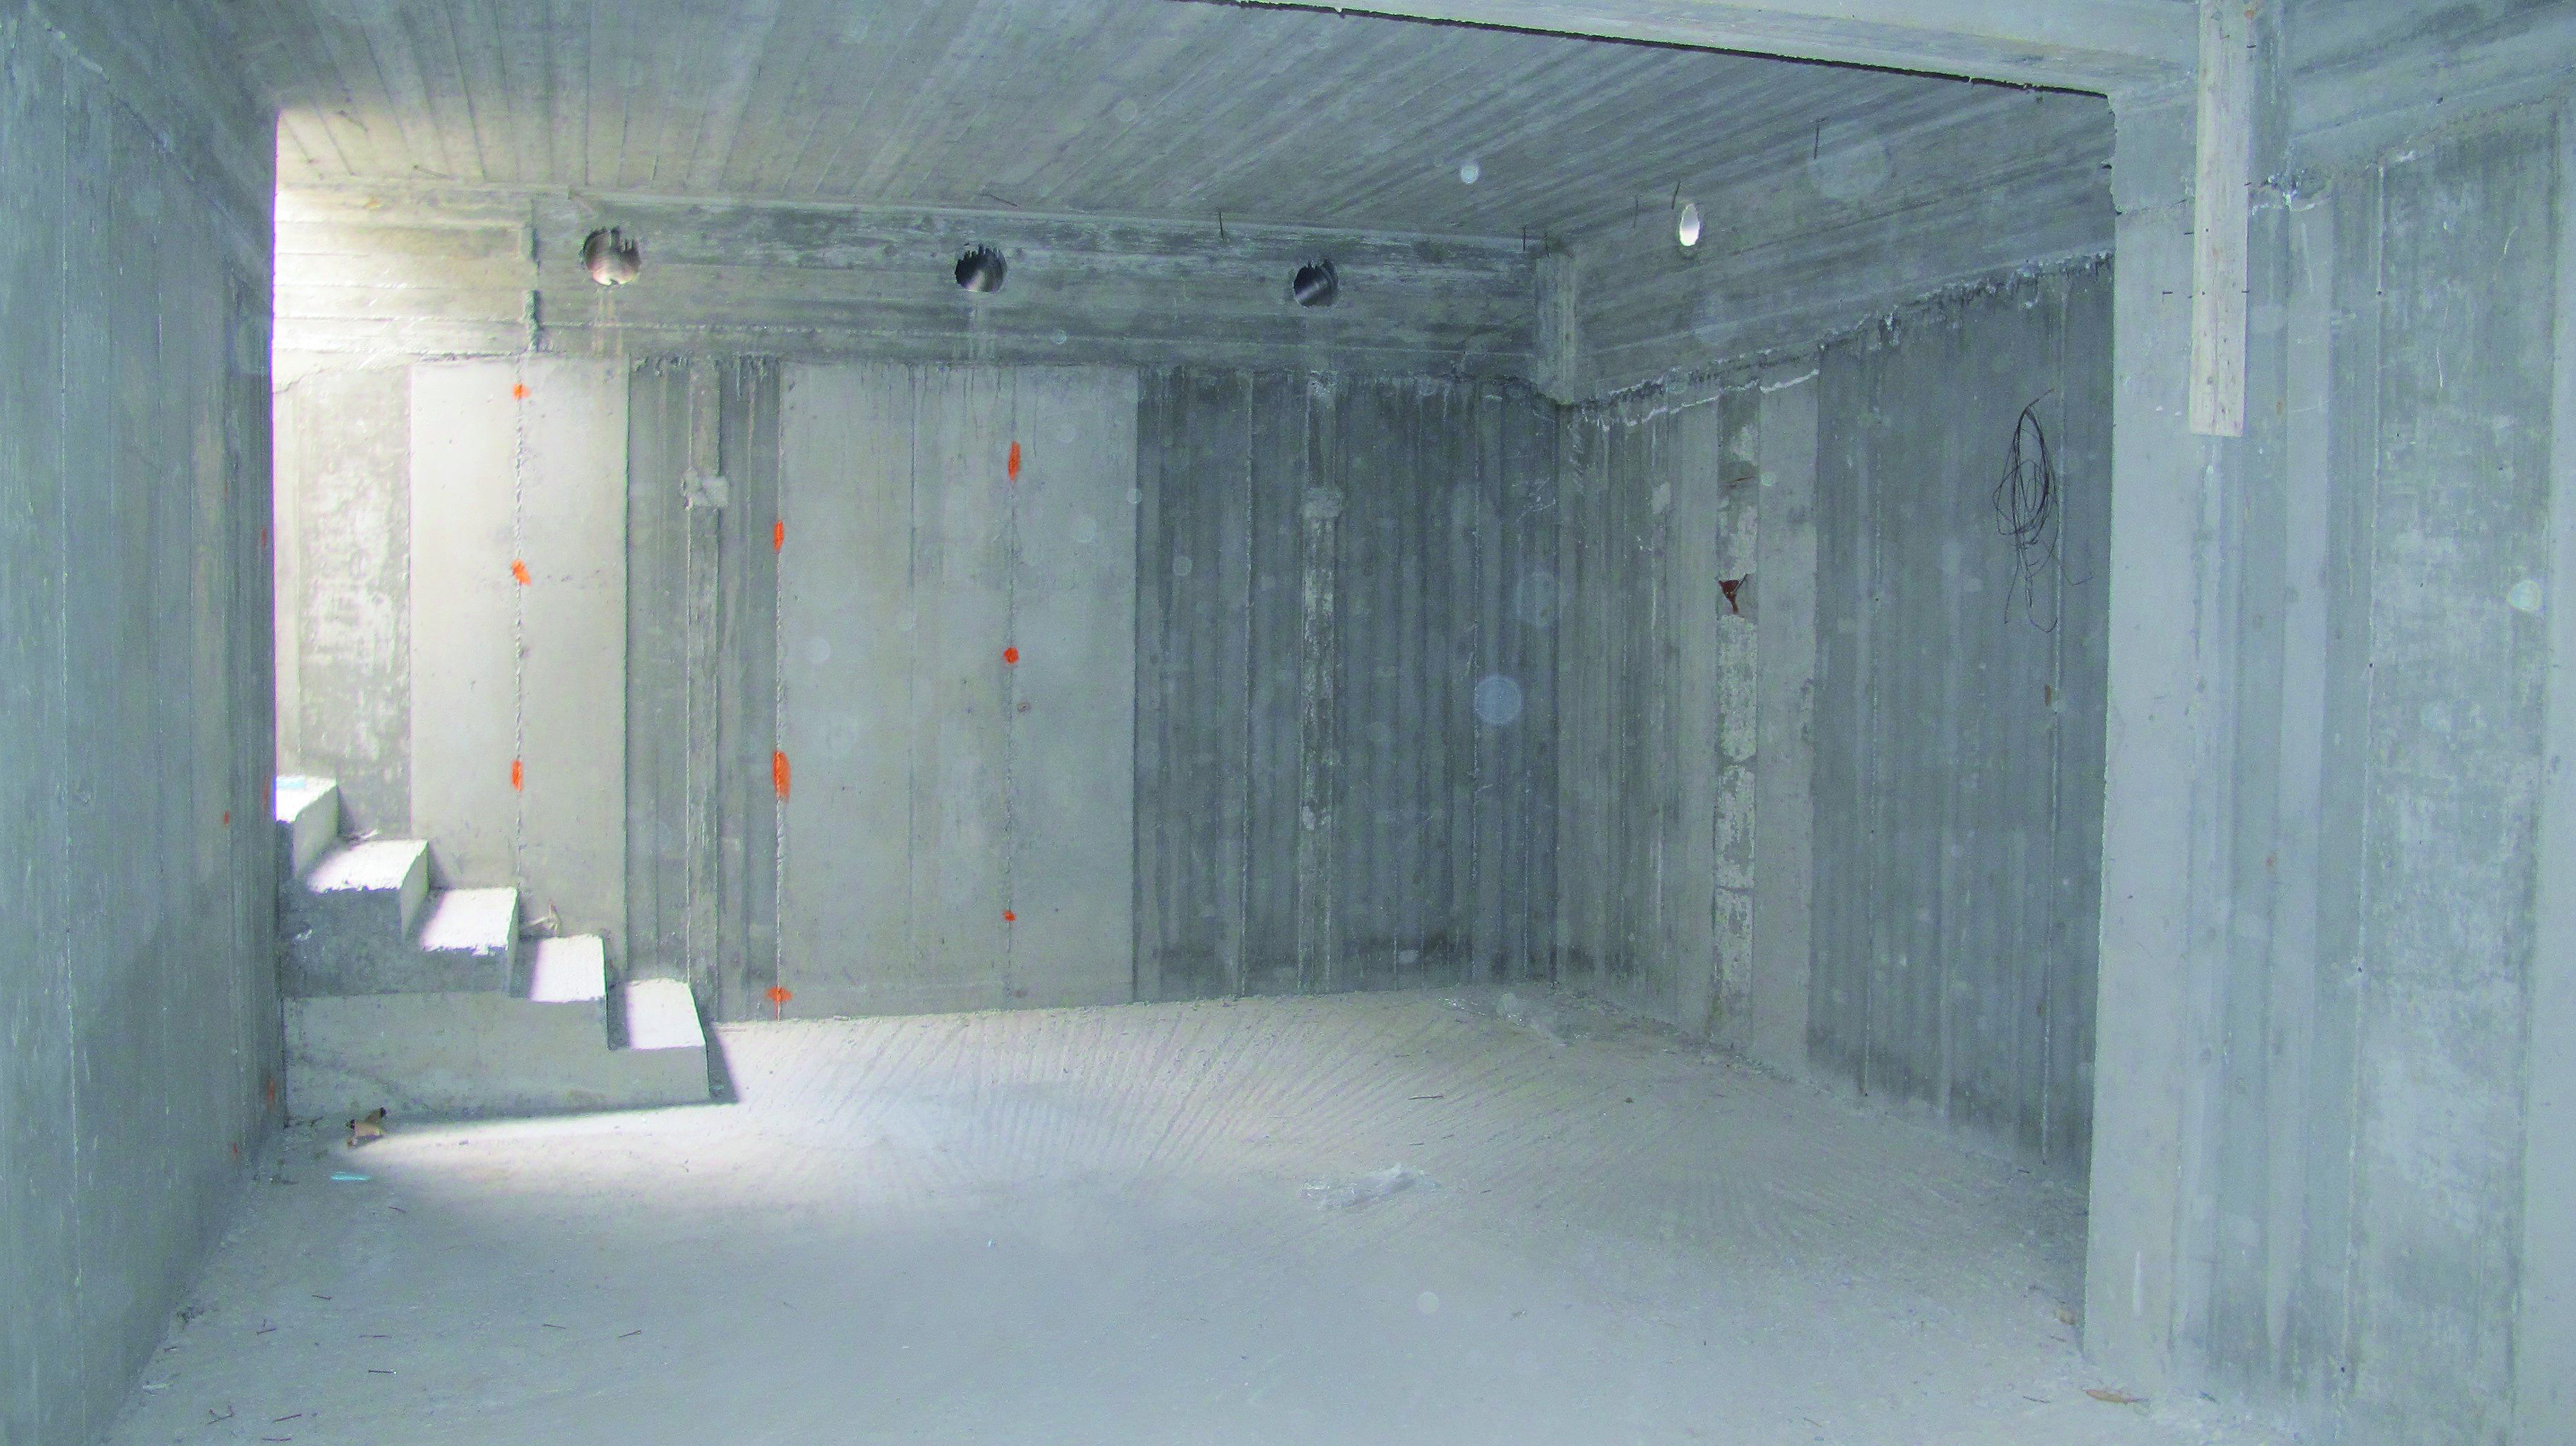 waterproofing systems thrakon